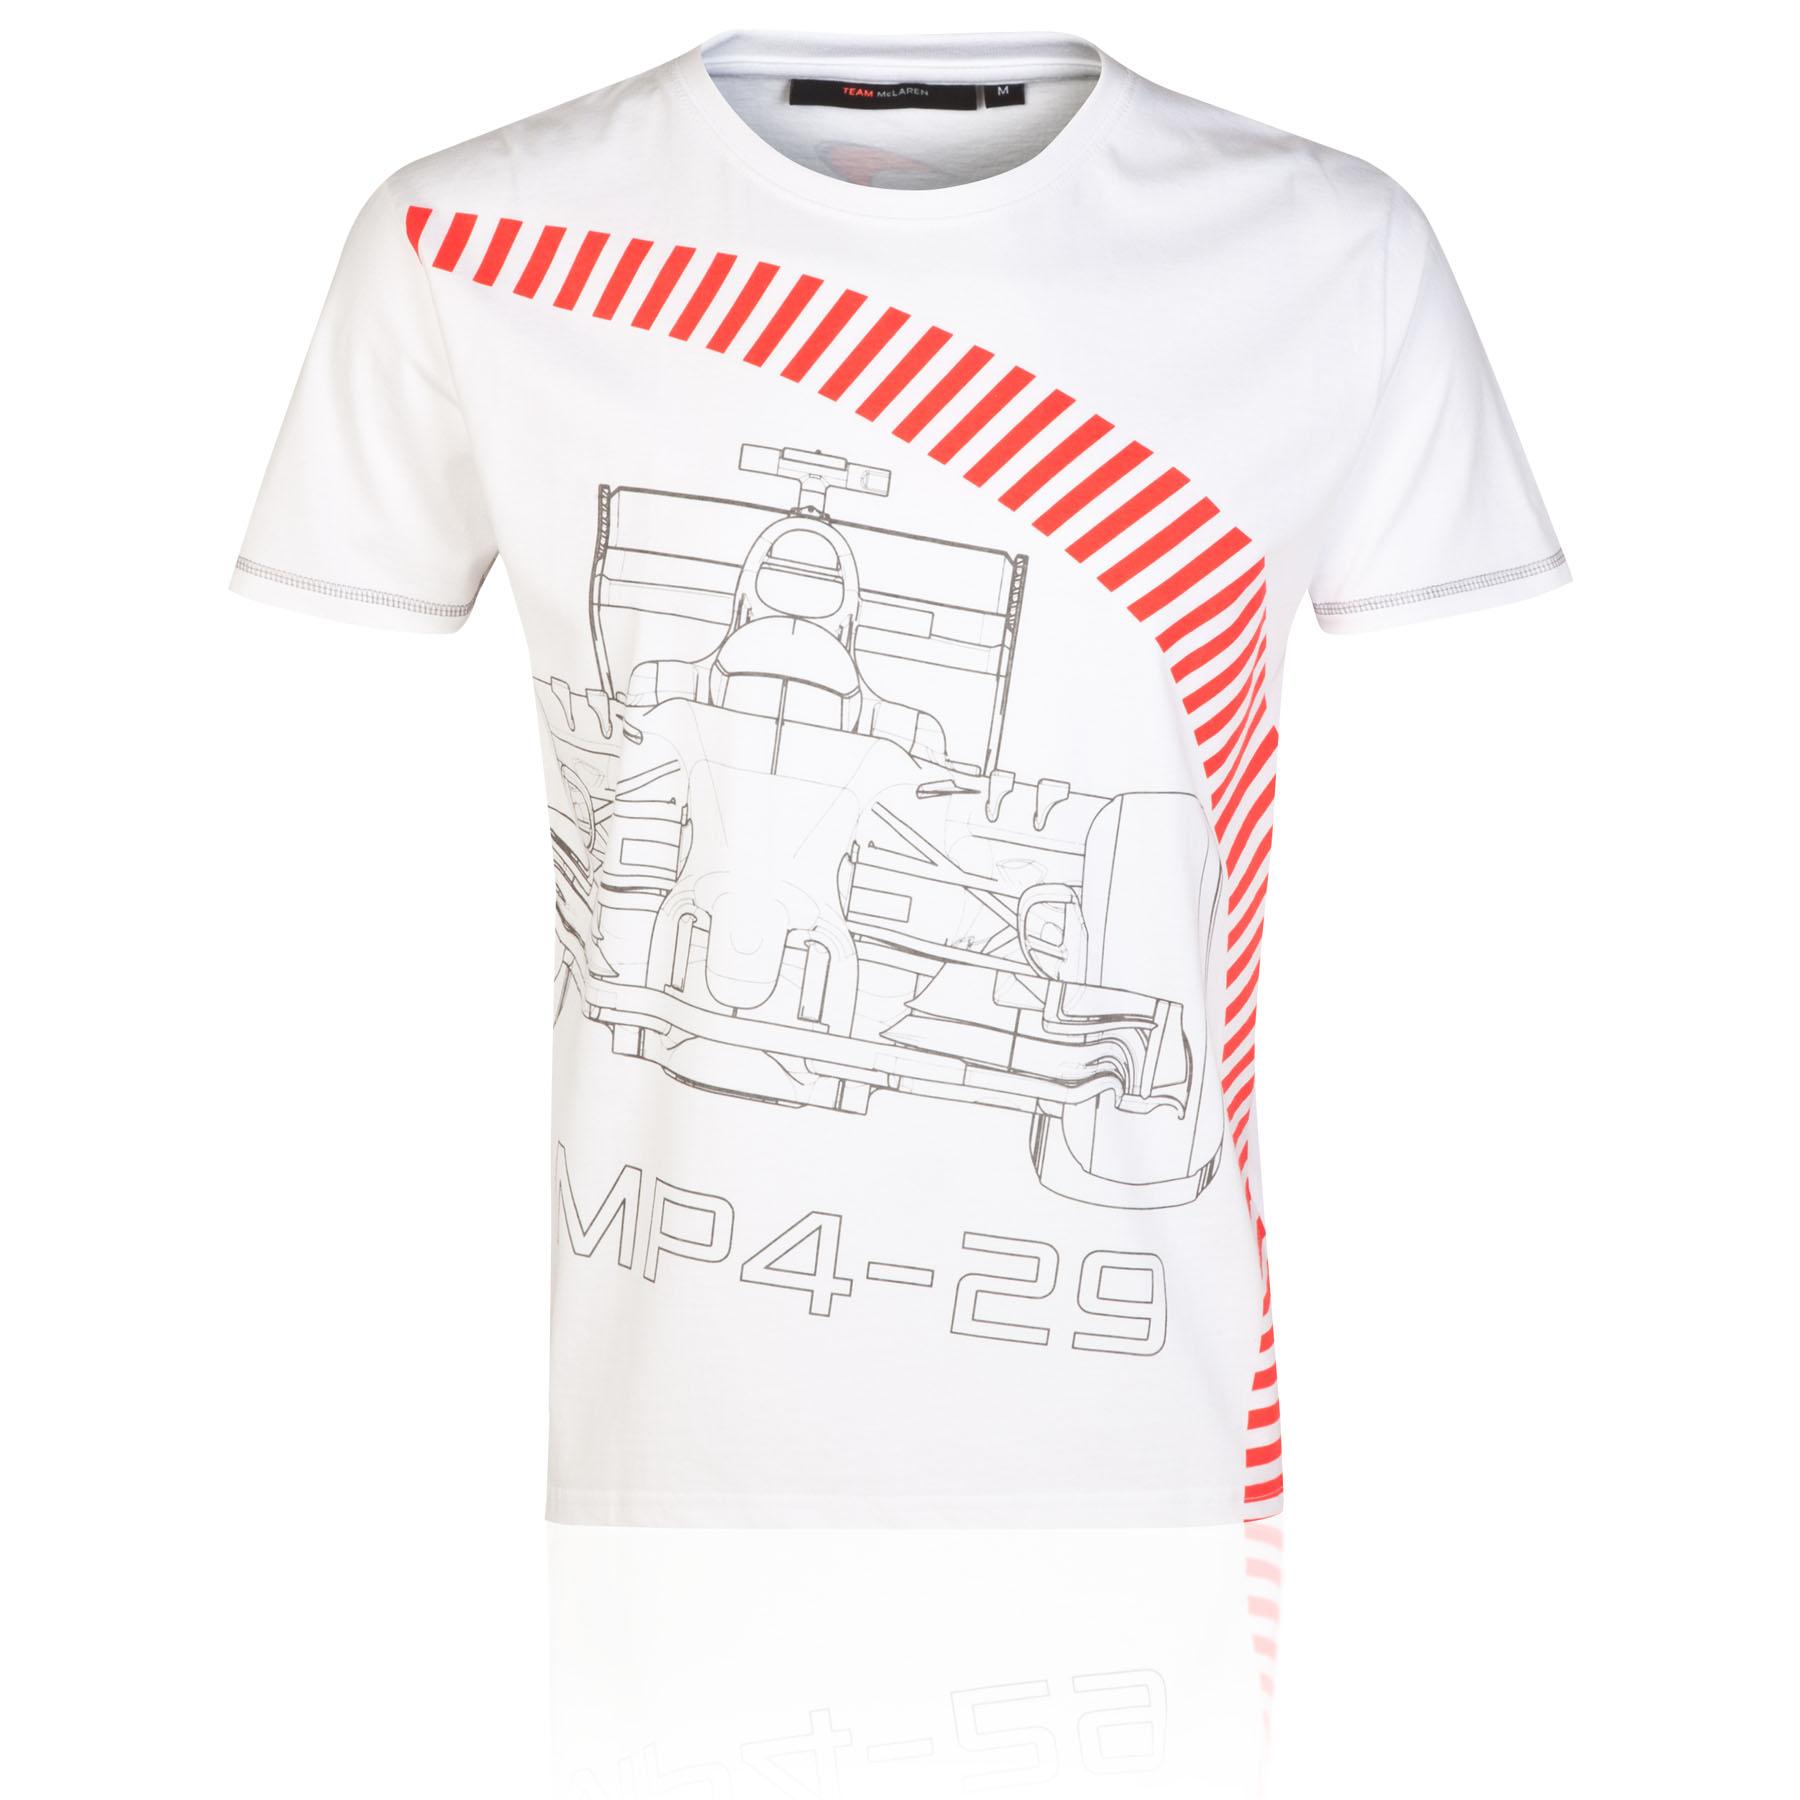 T-Shirts, Polos & Tops|Gifts for Men|Formula 1 McLaren Mercedes MP4-29 Kerb T-Shirt